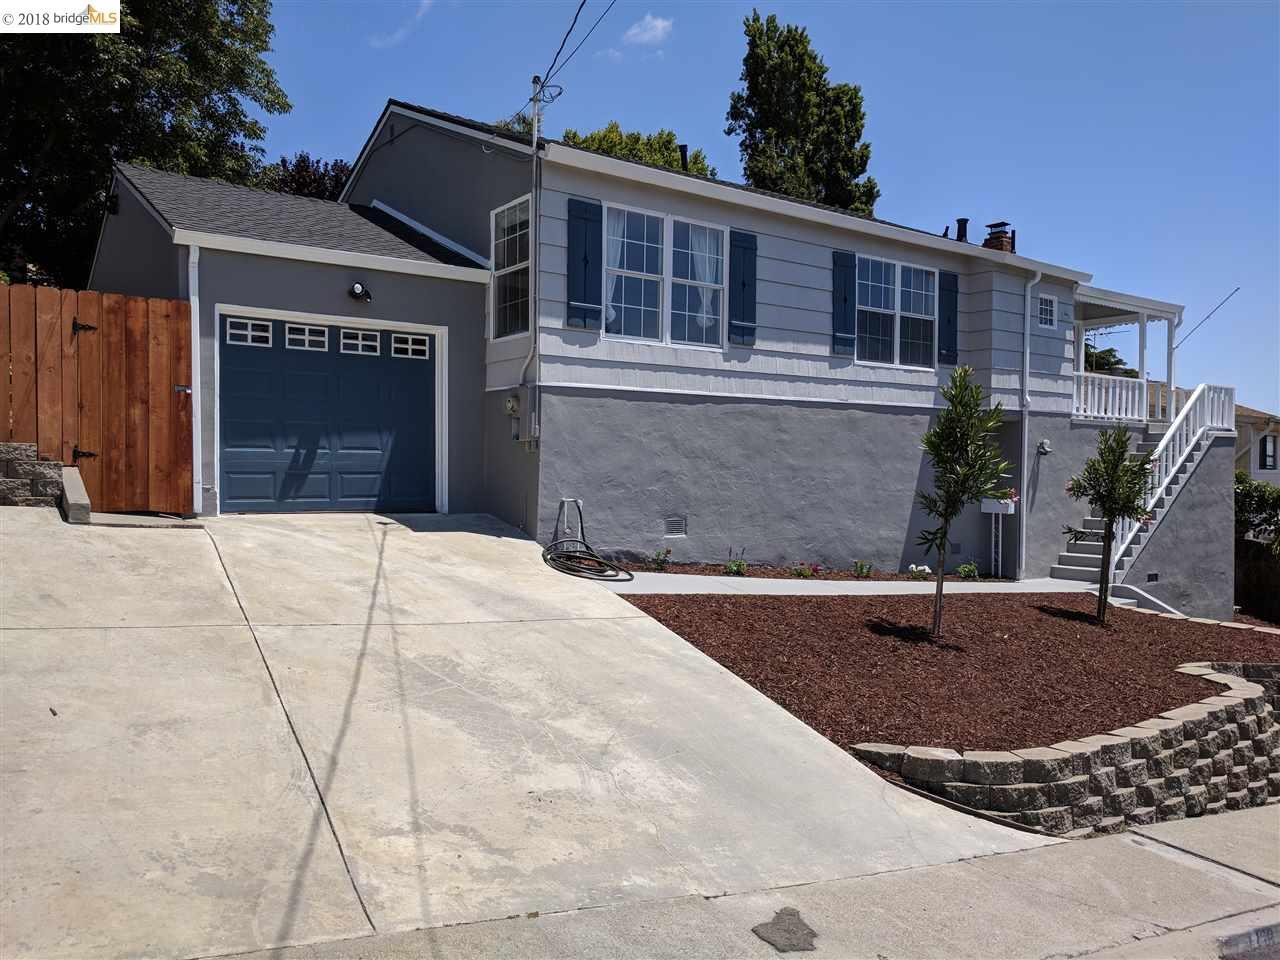 1968 MANCHESTER RD, SAN LEANDRO, CA 94578